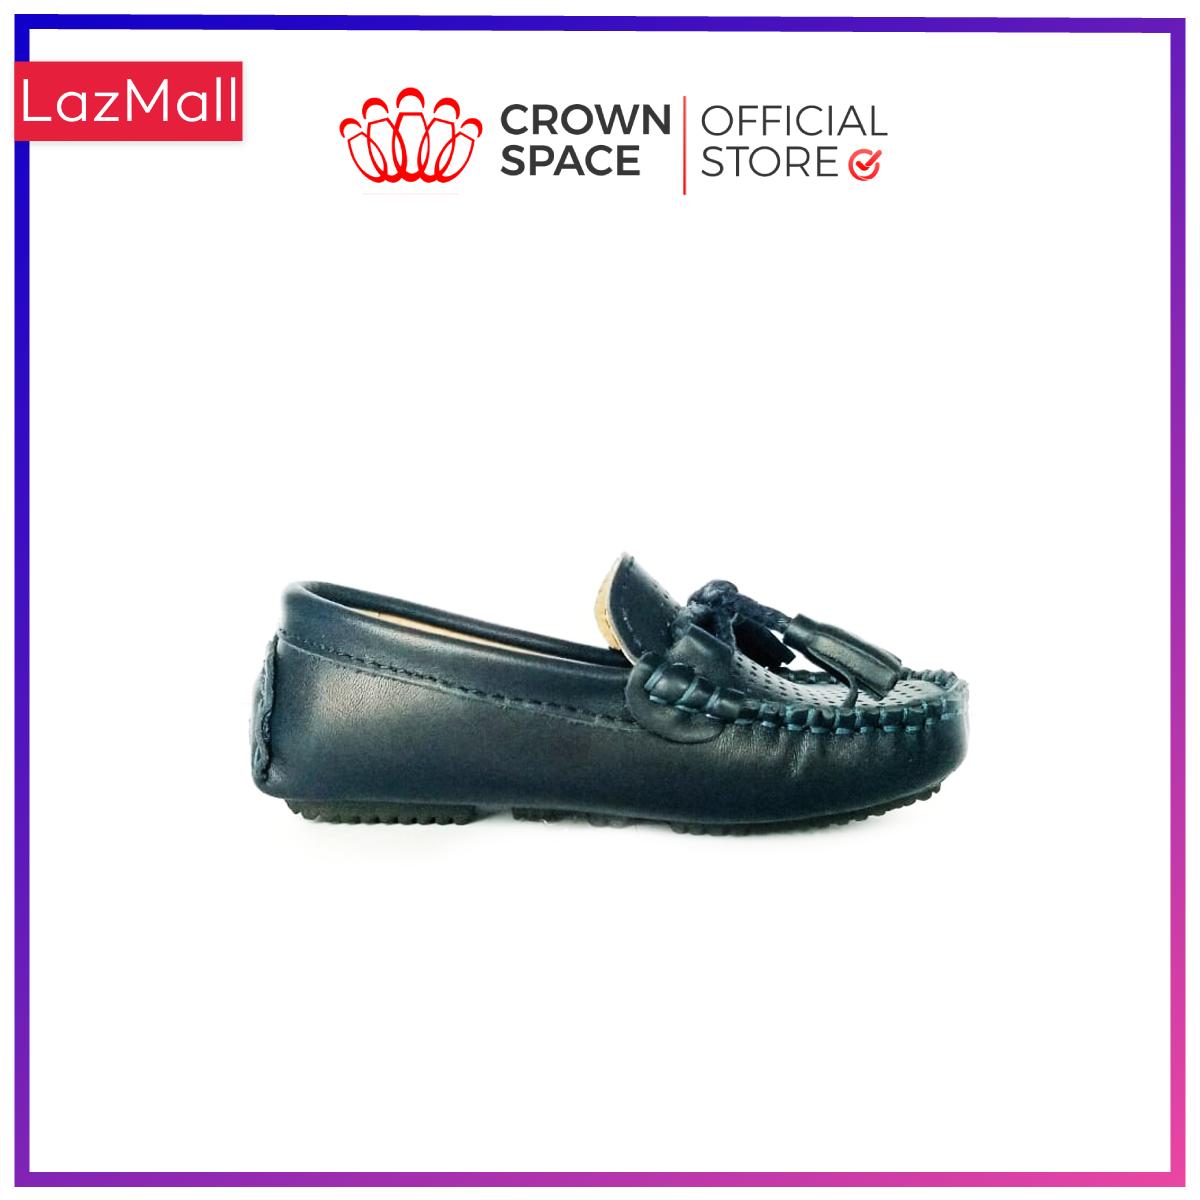 Giày Lười Loafer Bé Trai Đẹp CrownUK George Louis Moccasin Trẻ em Nam Cao Cấp CRUK440 Nhẹ Êm Thoáng Size 26-35/2-14 Tuổi